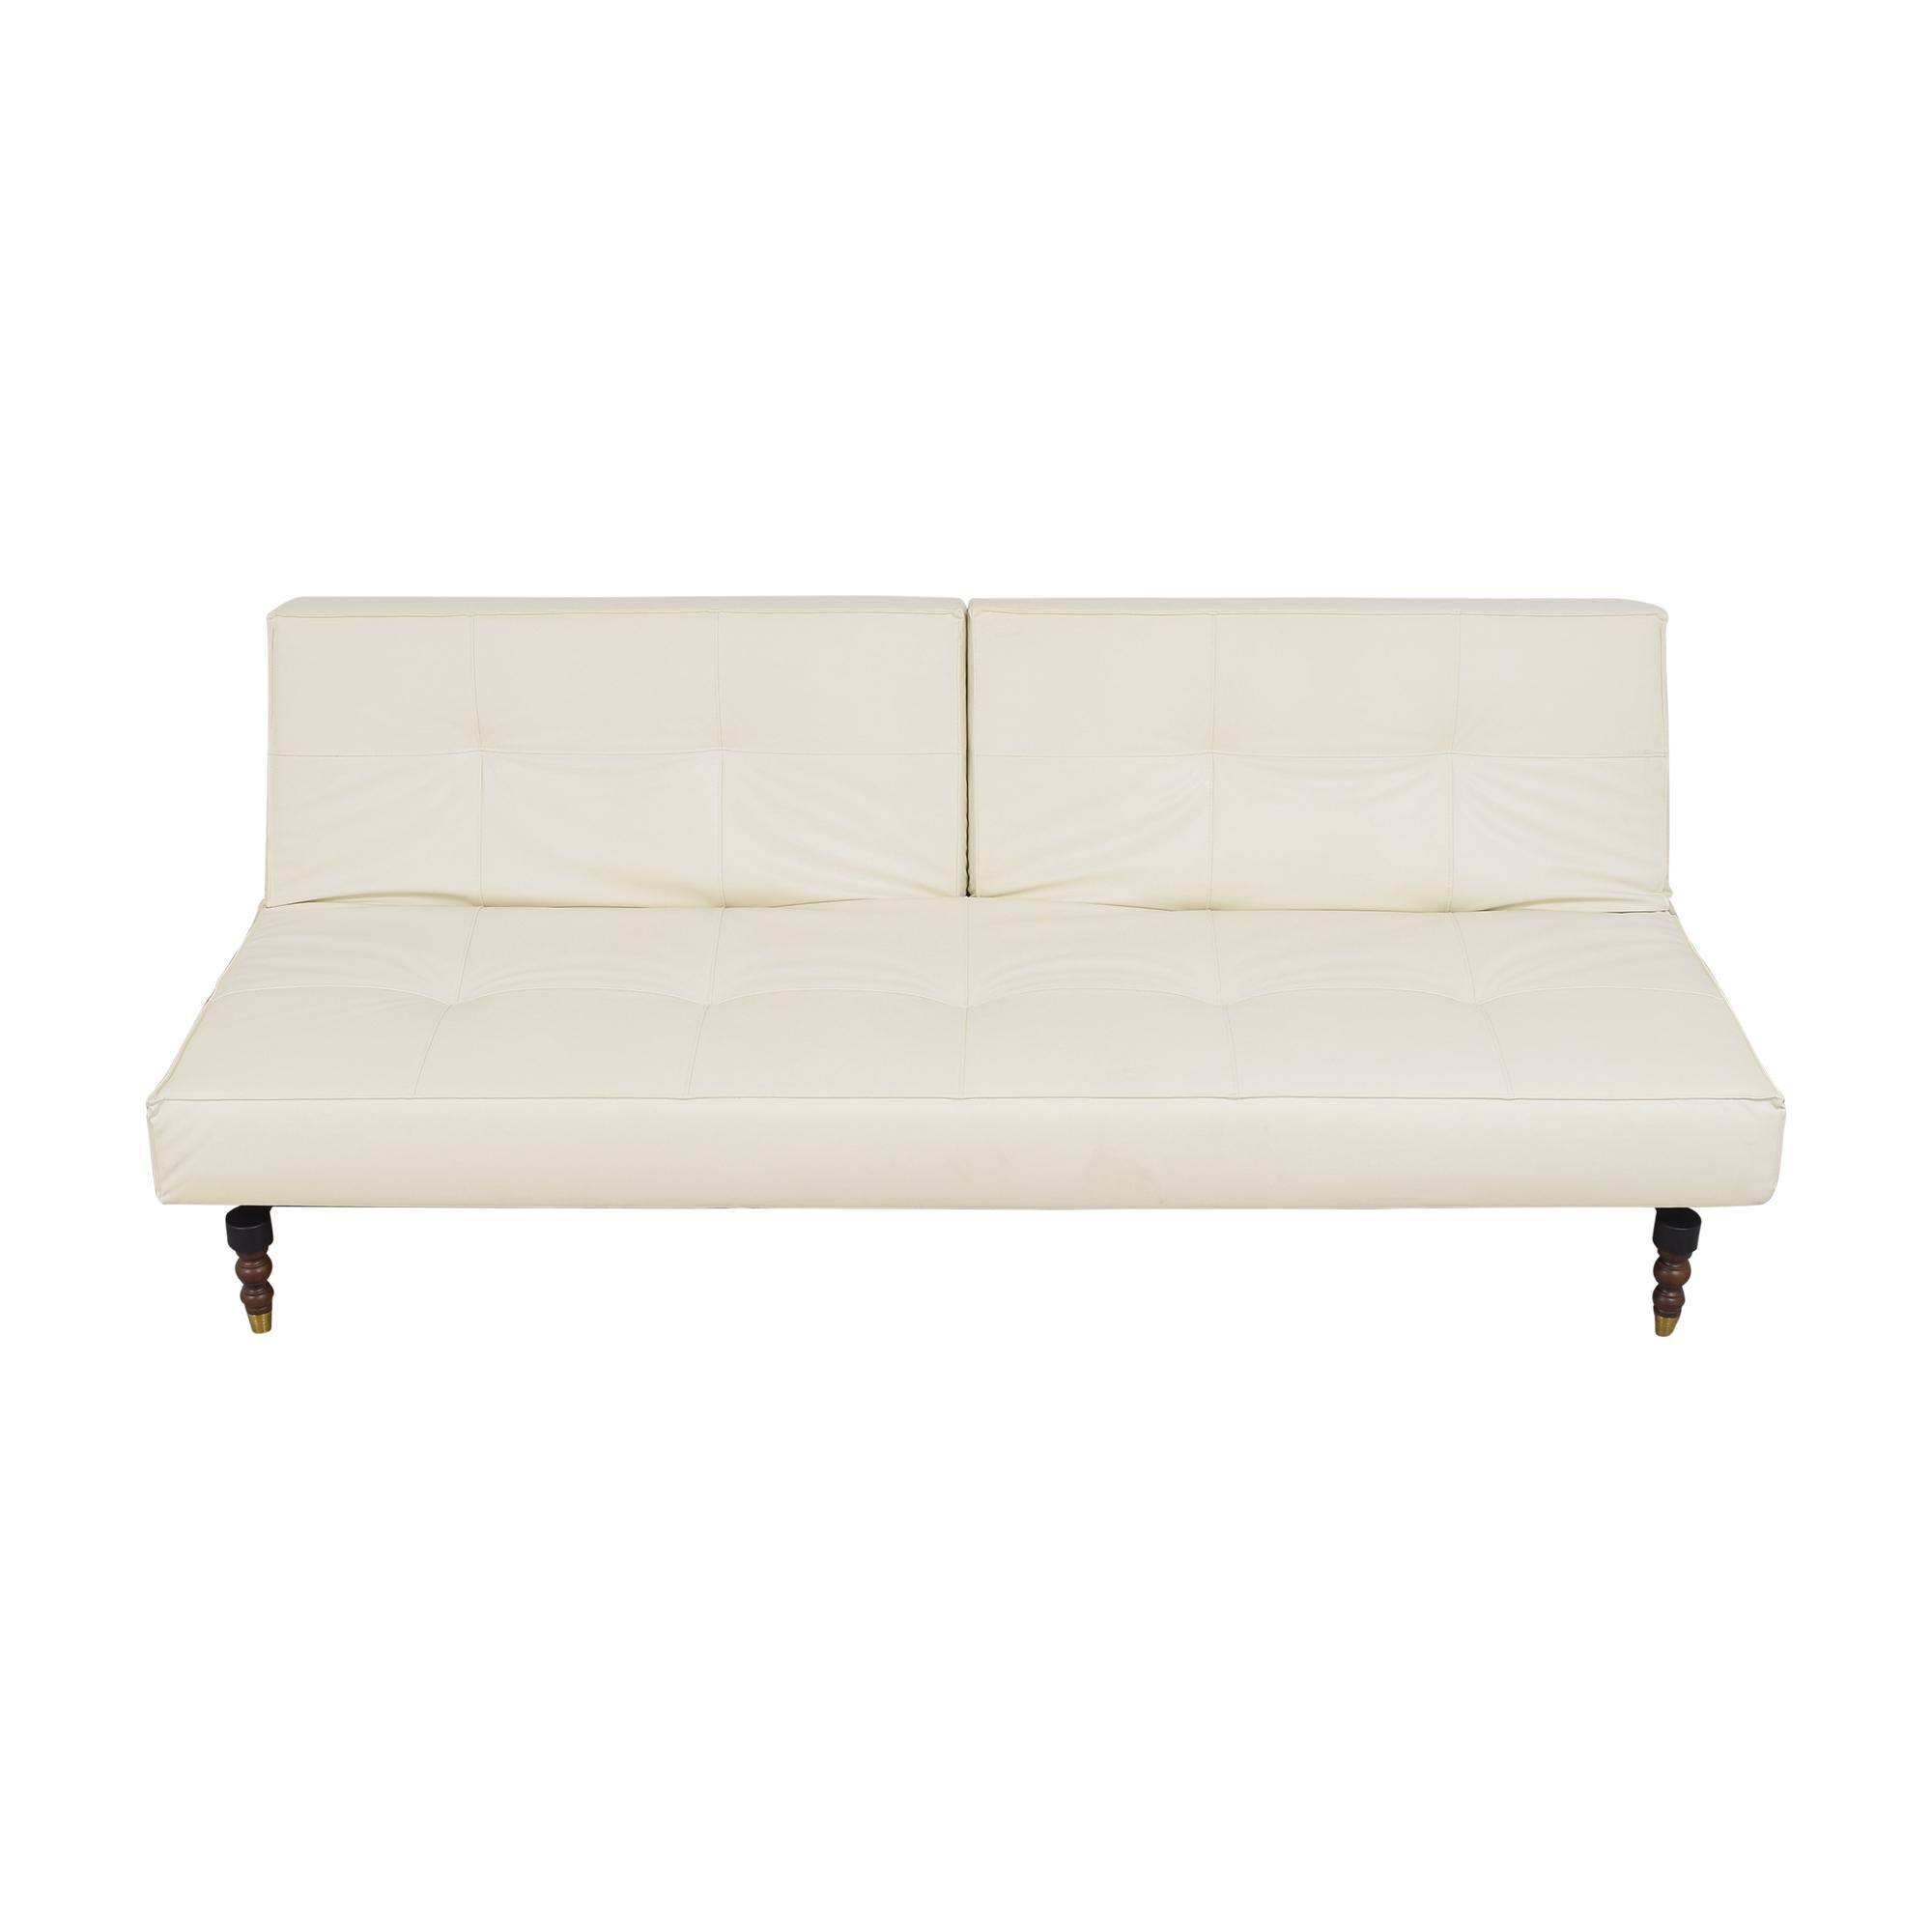 Innovation Living Innovation Living Splitback Convertible Sleeper Sofa pa